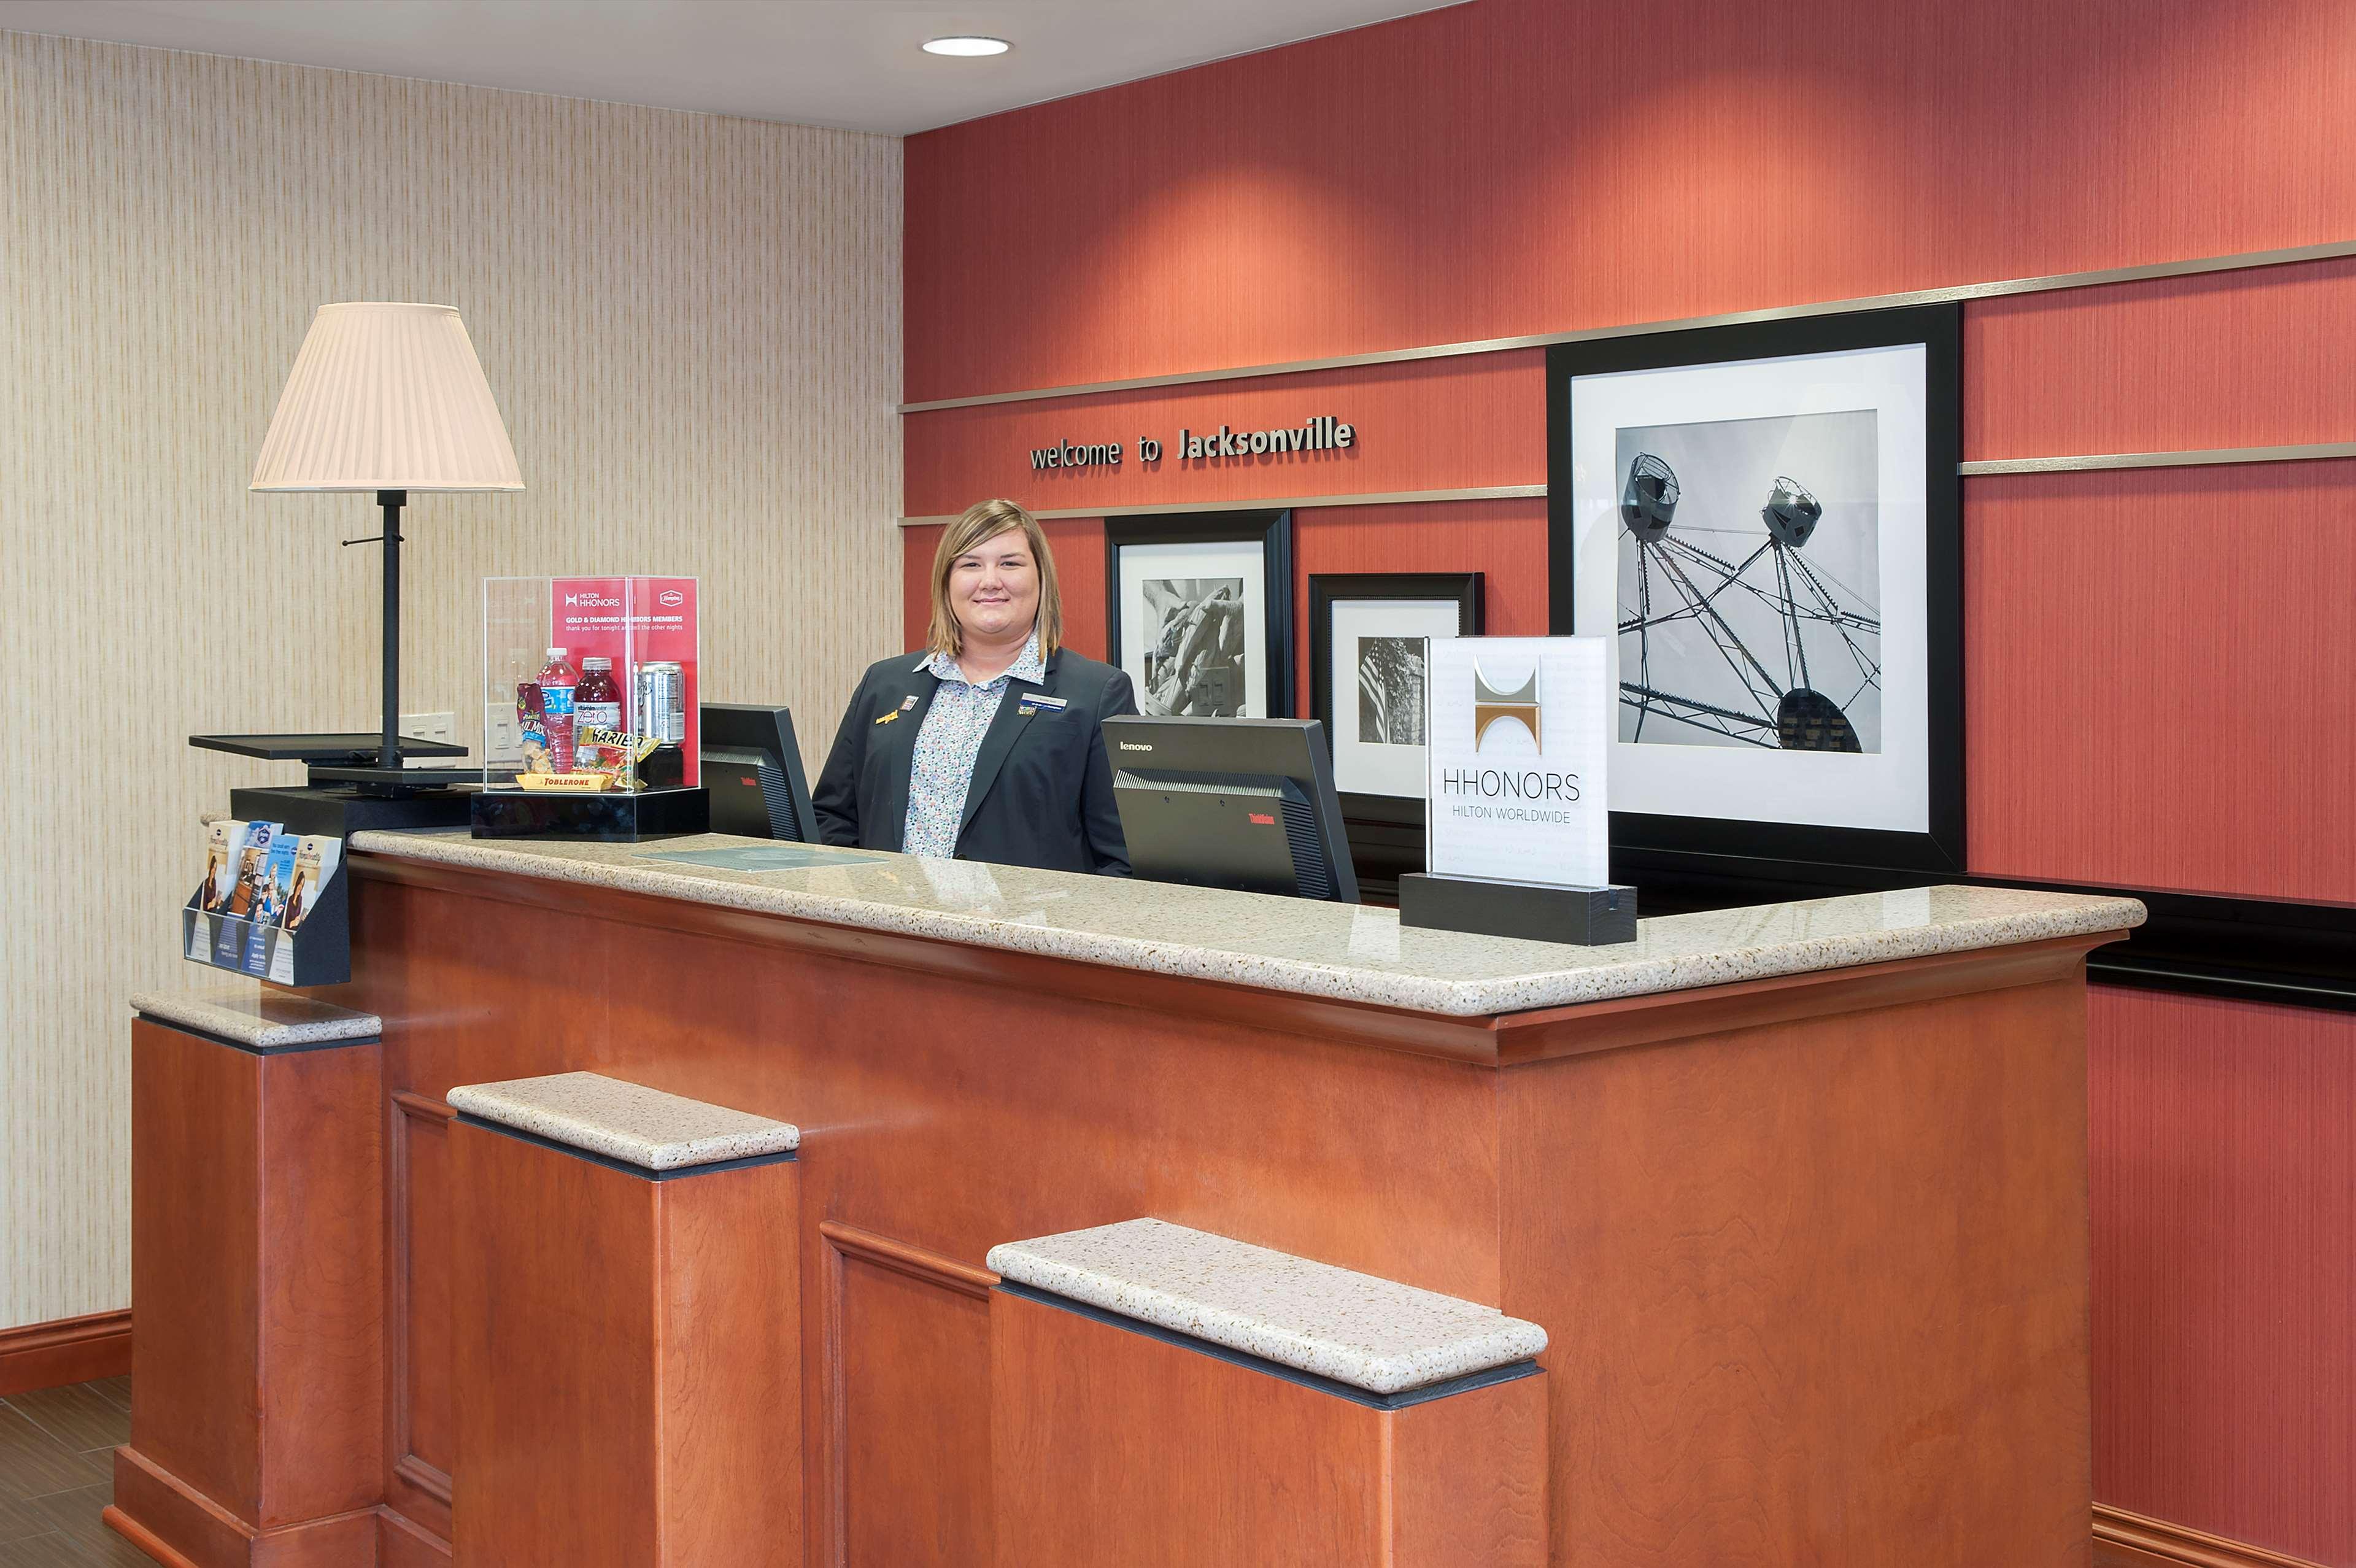 Hampton Inn Jacksonville image 1